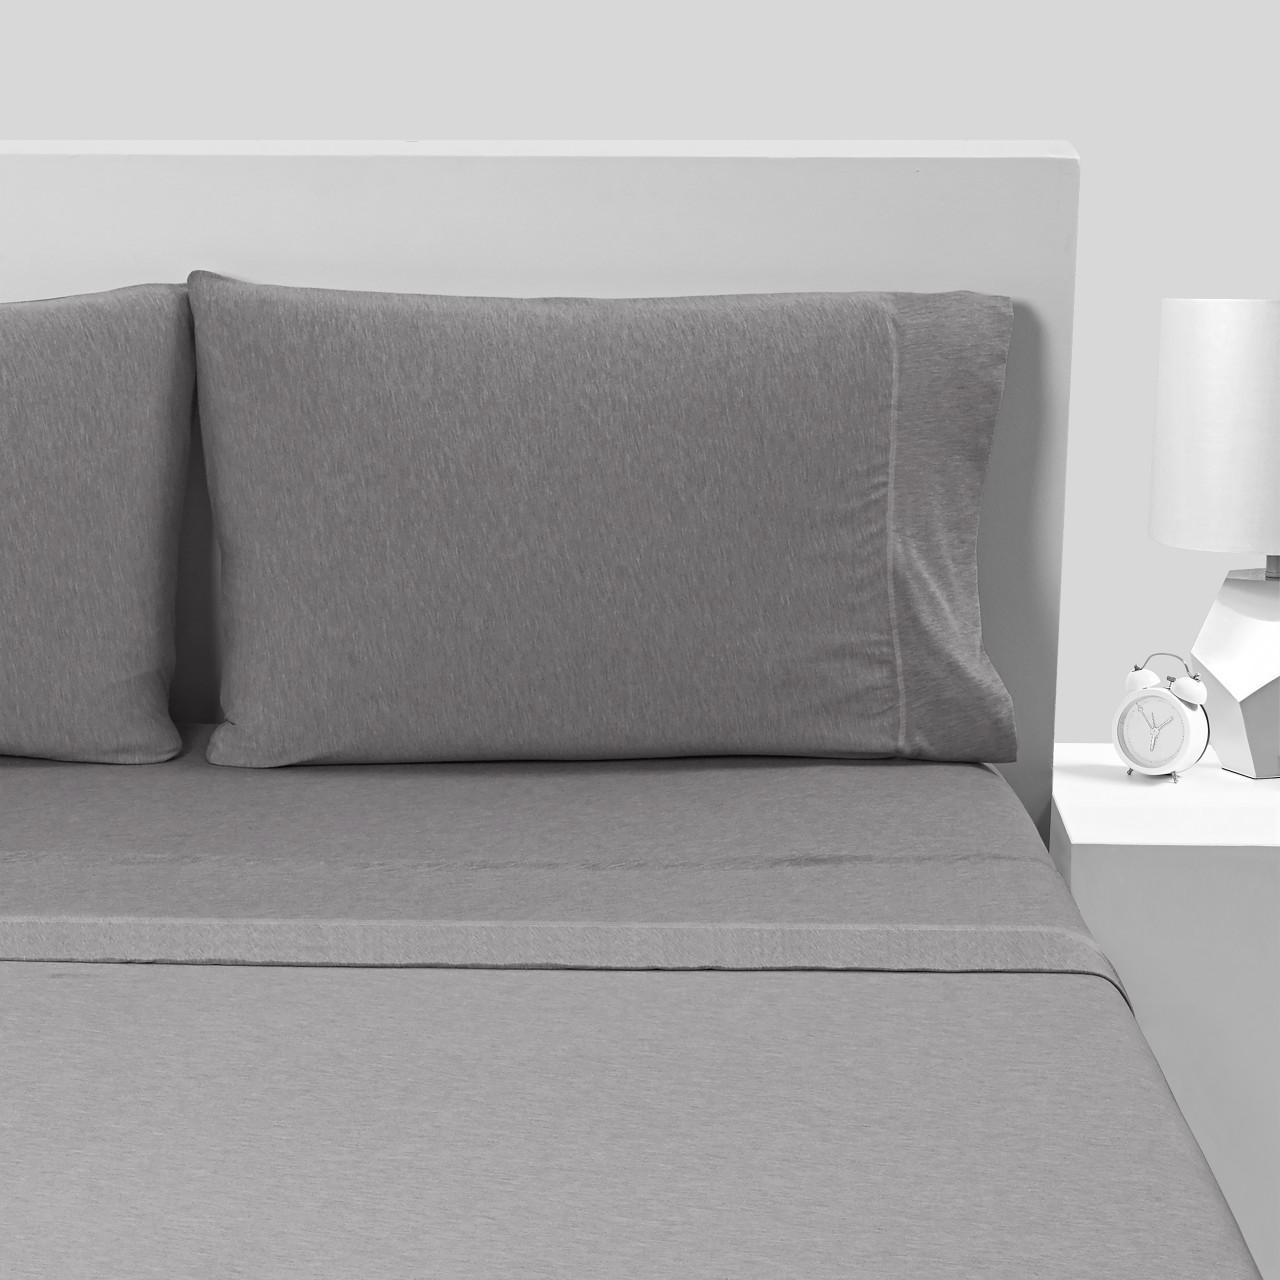 Bedgear Hyper-Wool Technology Performance Wool Sheet Set - Grey - King - BGS28AMS1FK, 814874021272